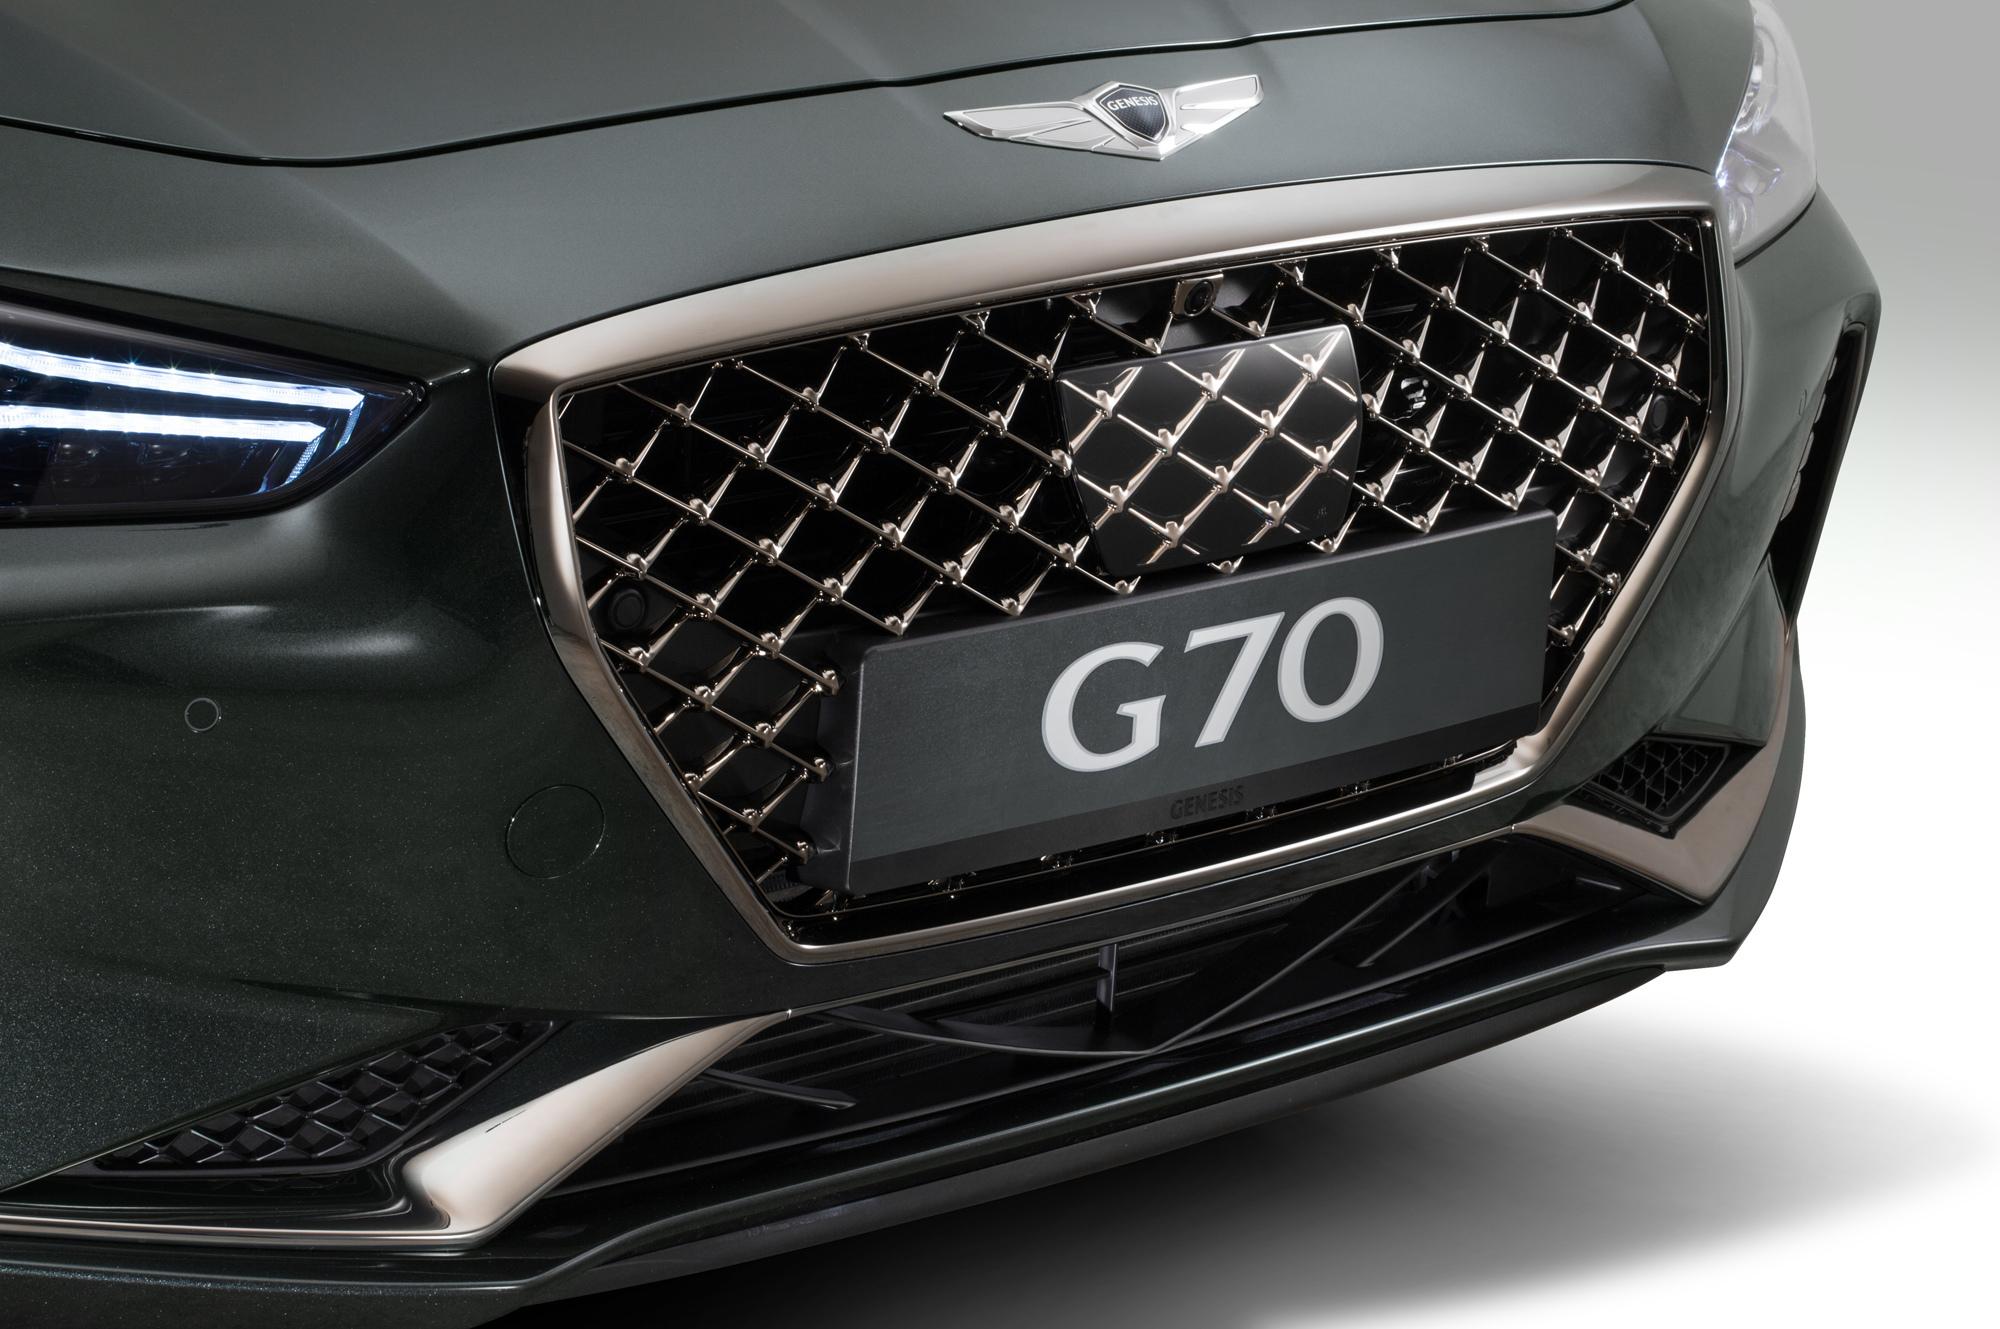 Genesis G70 Widescreen